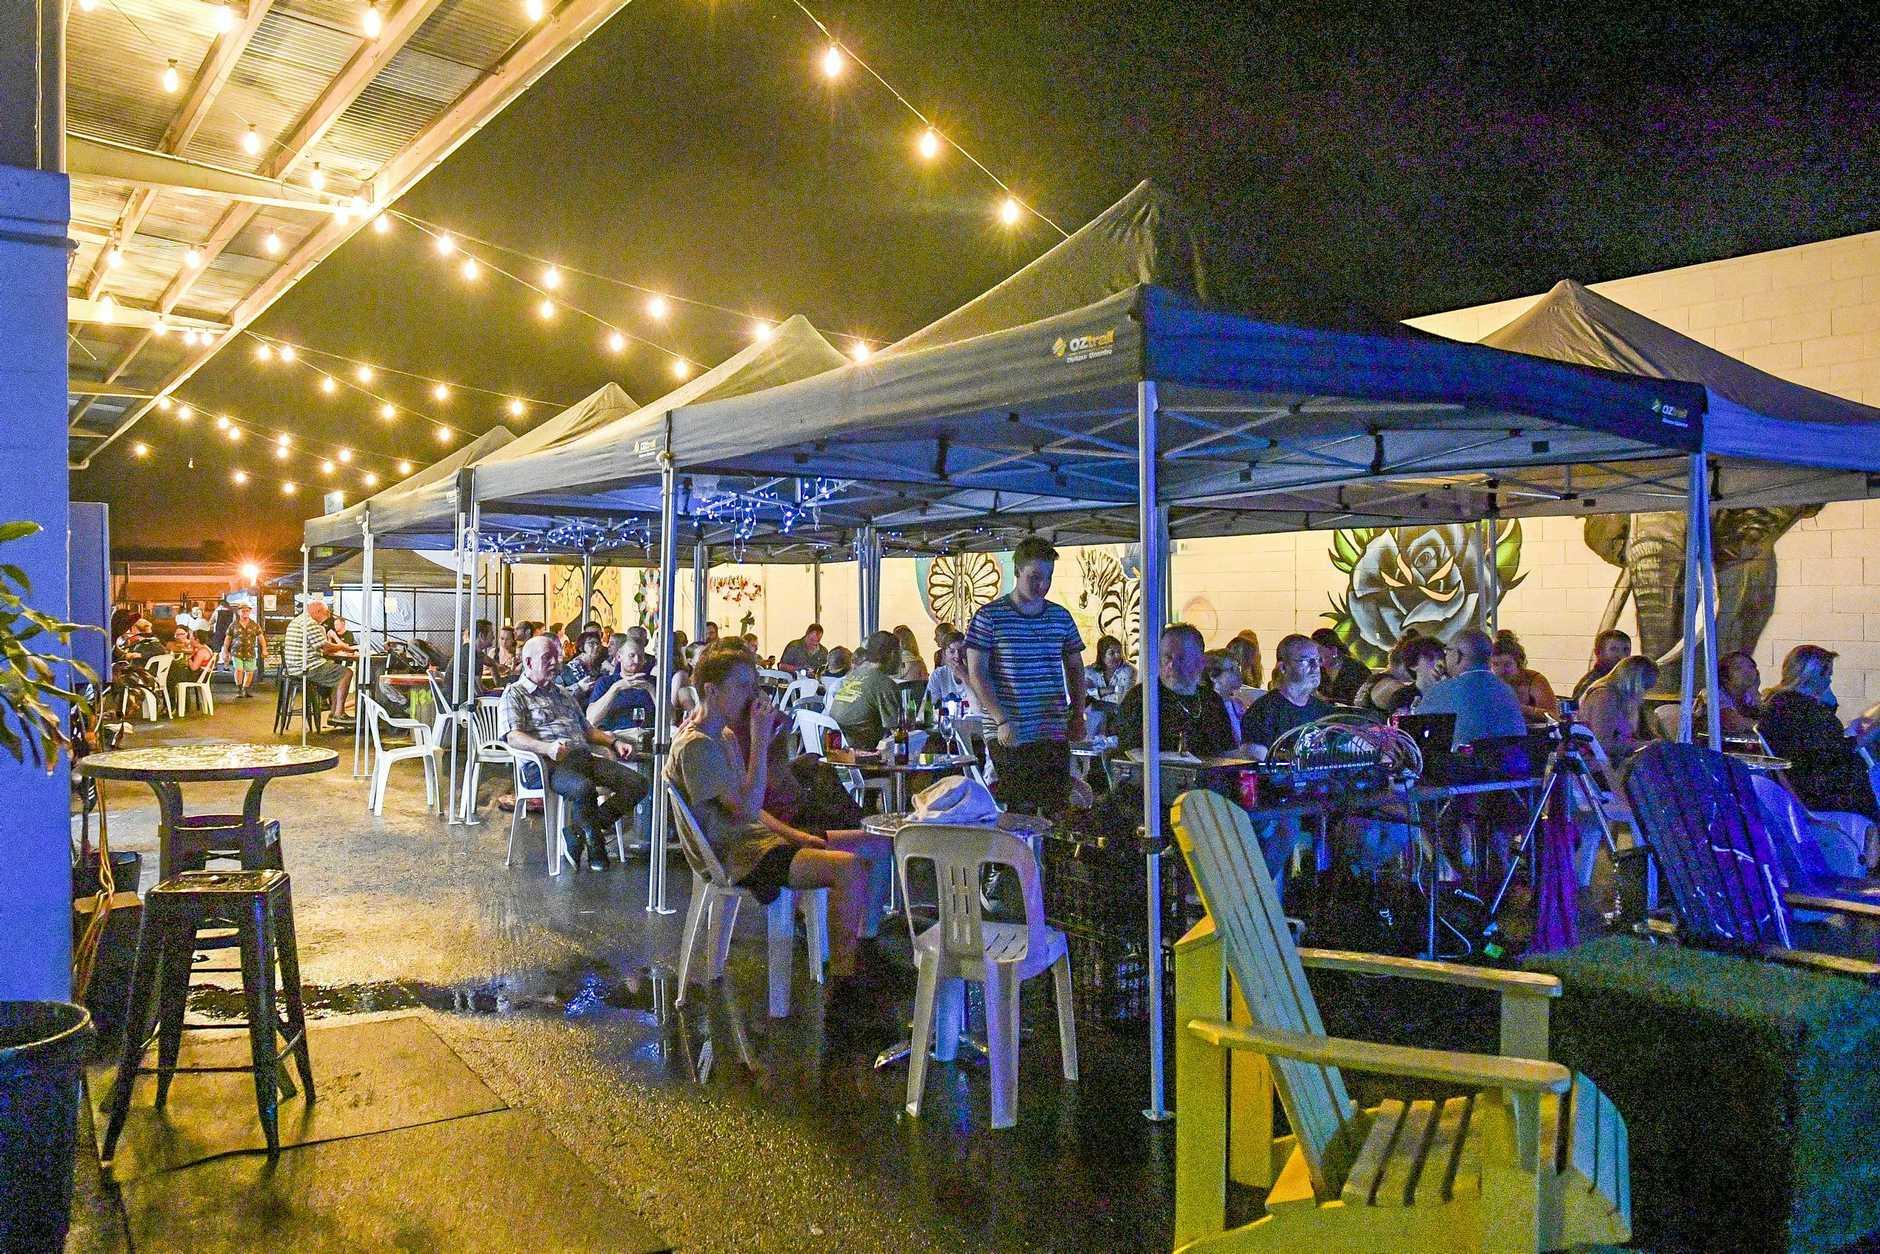 FUN NIGHT: Crow Street Creative's food and music returns tonight.